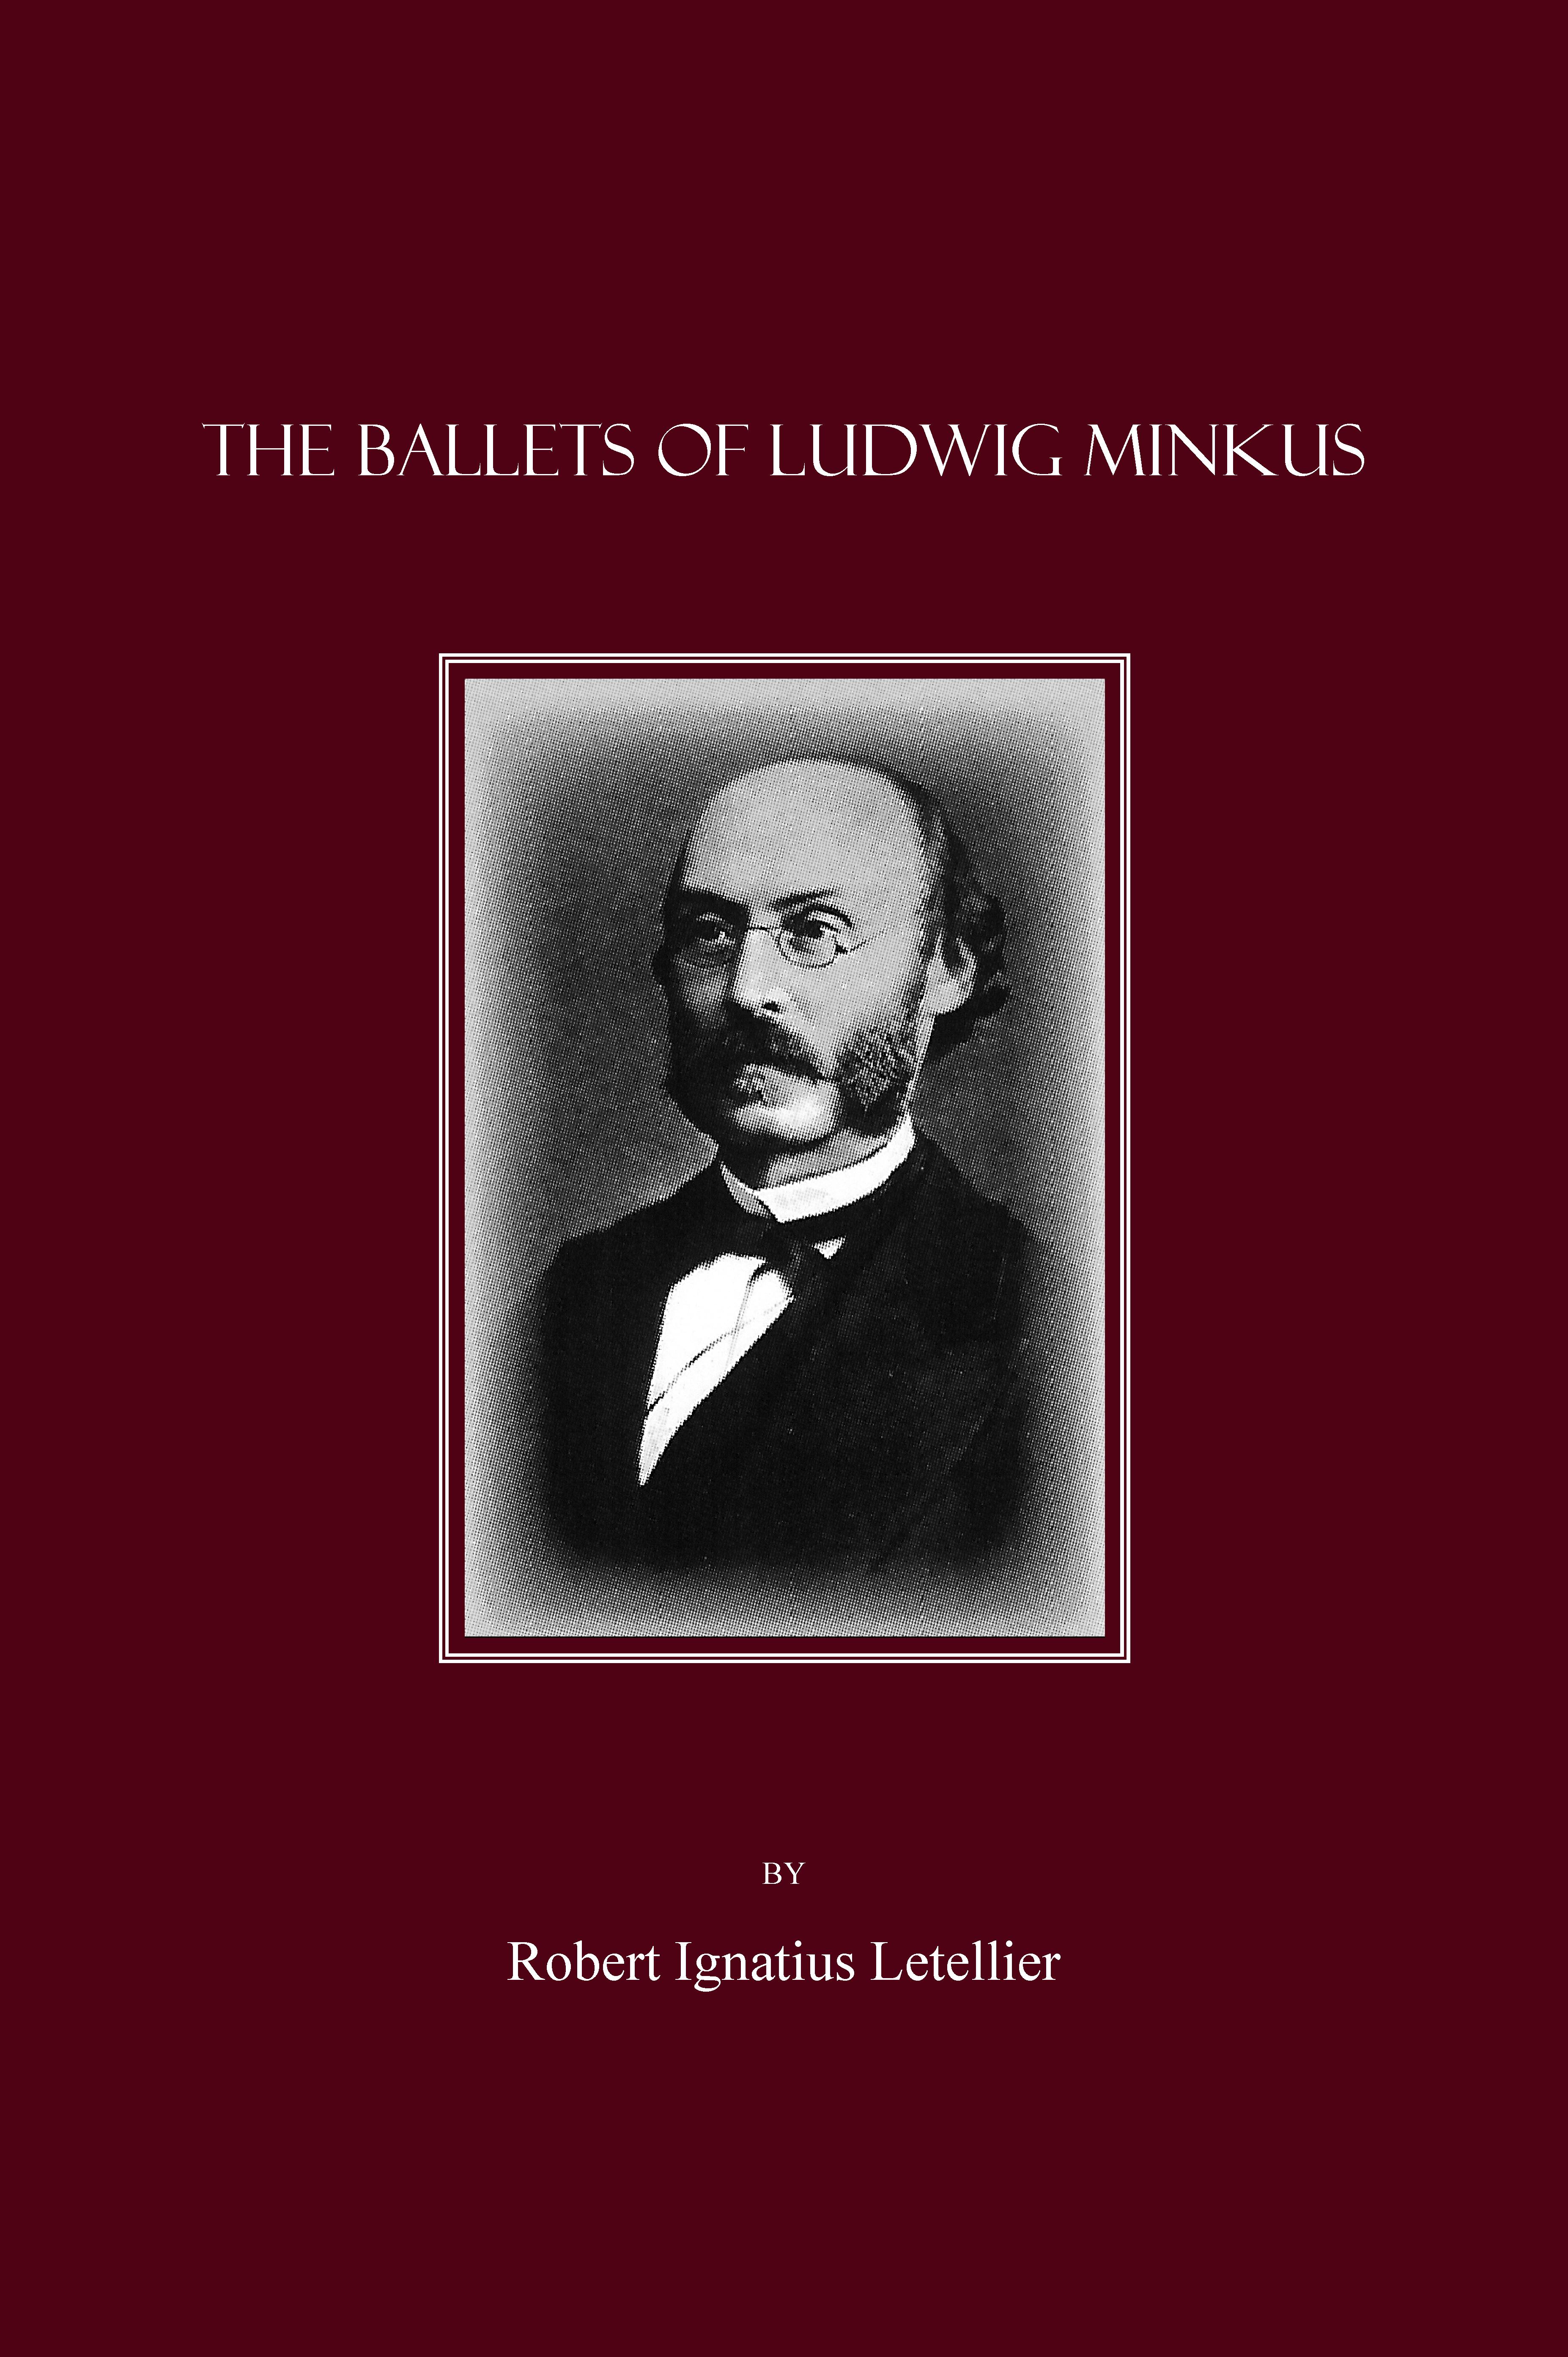 The Ballets of Ludwig Minkus